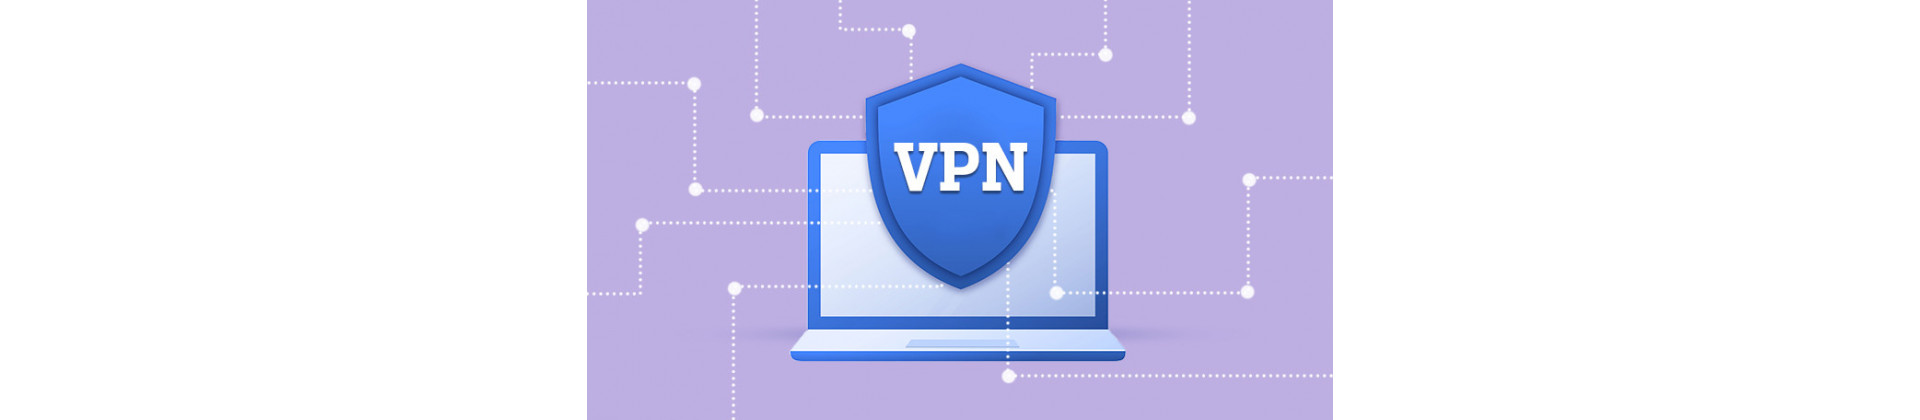 VPN Subscriptions